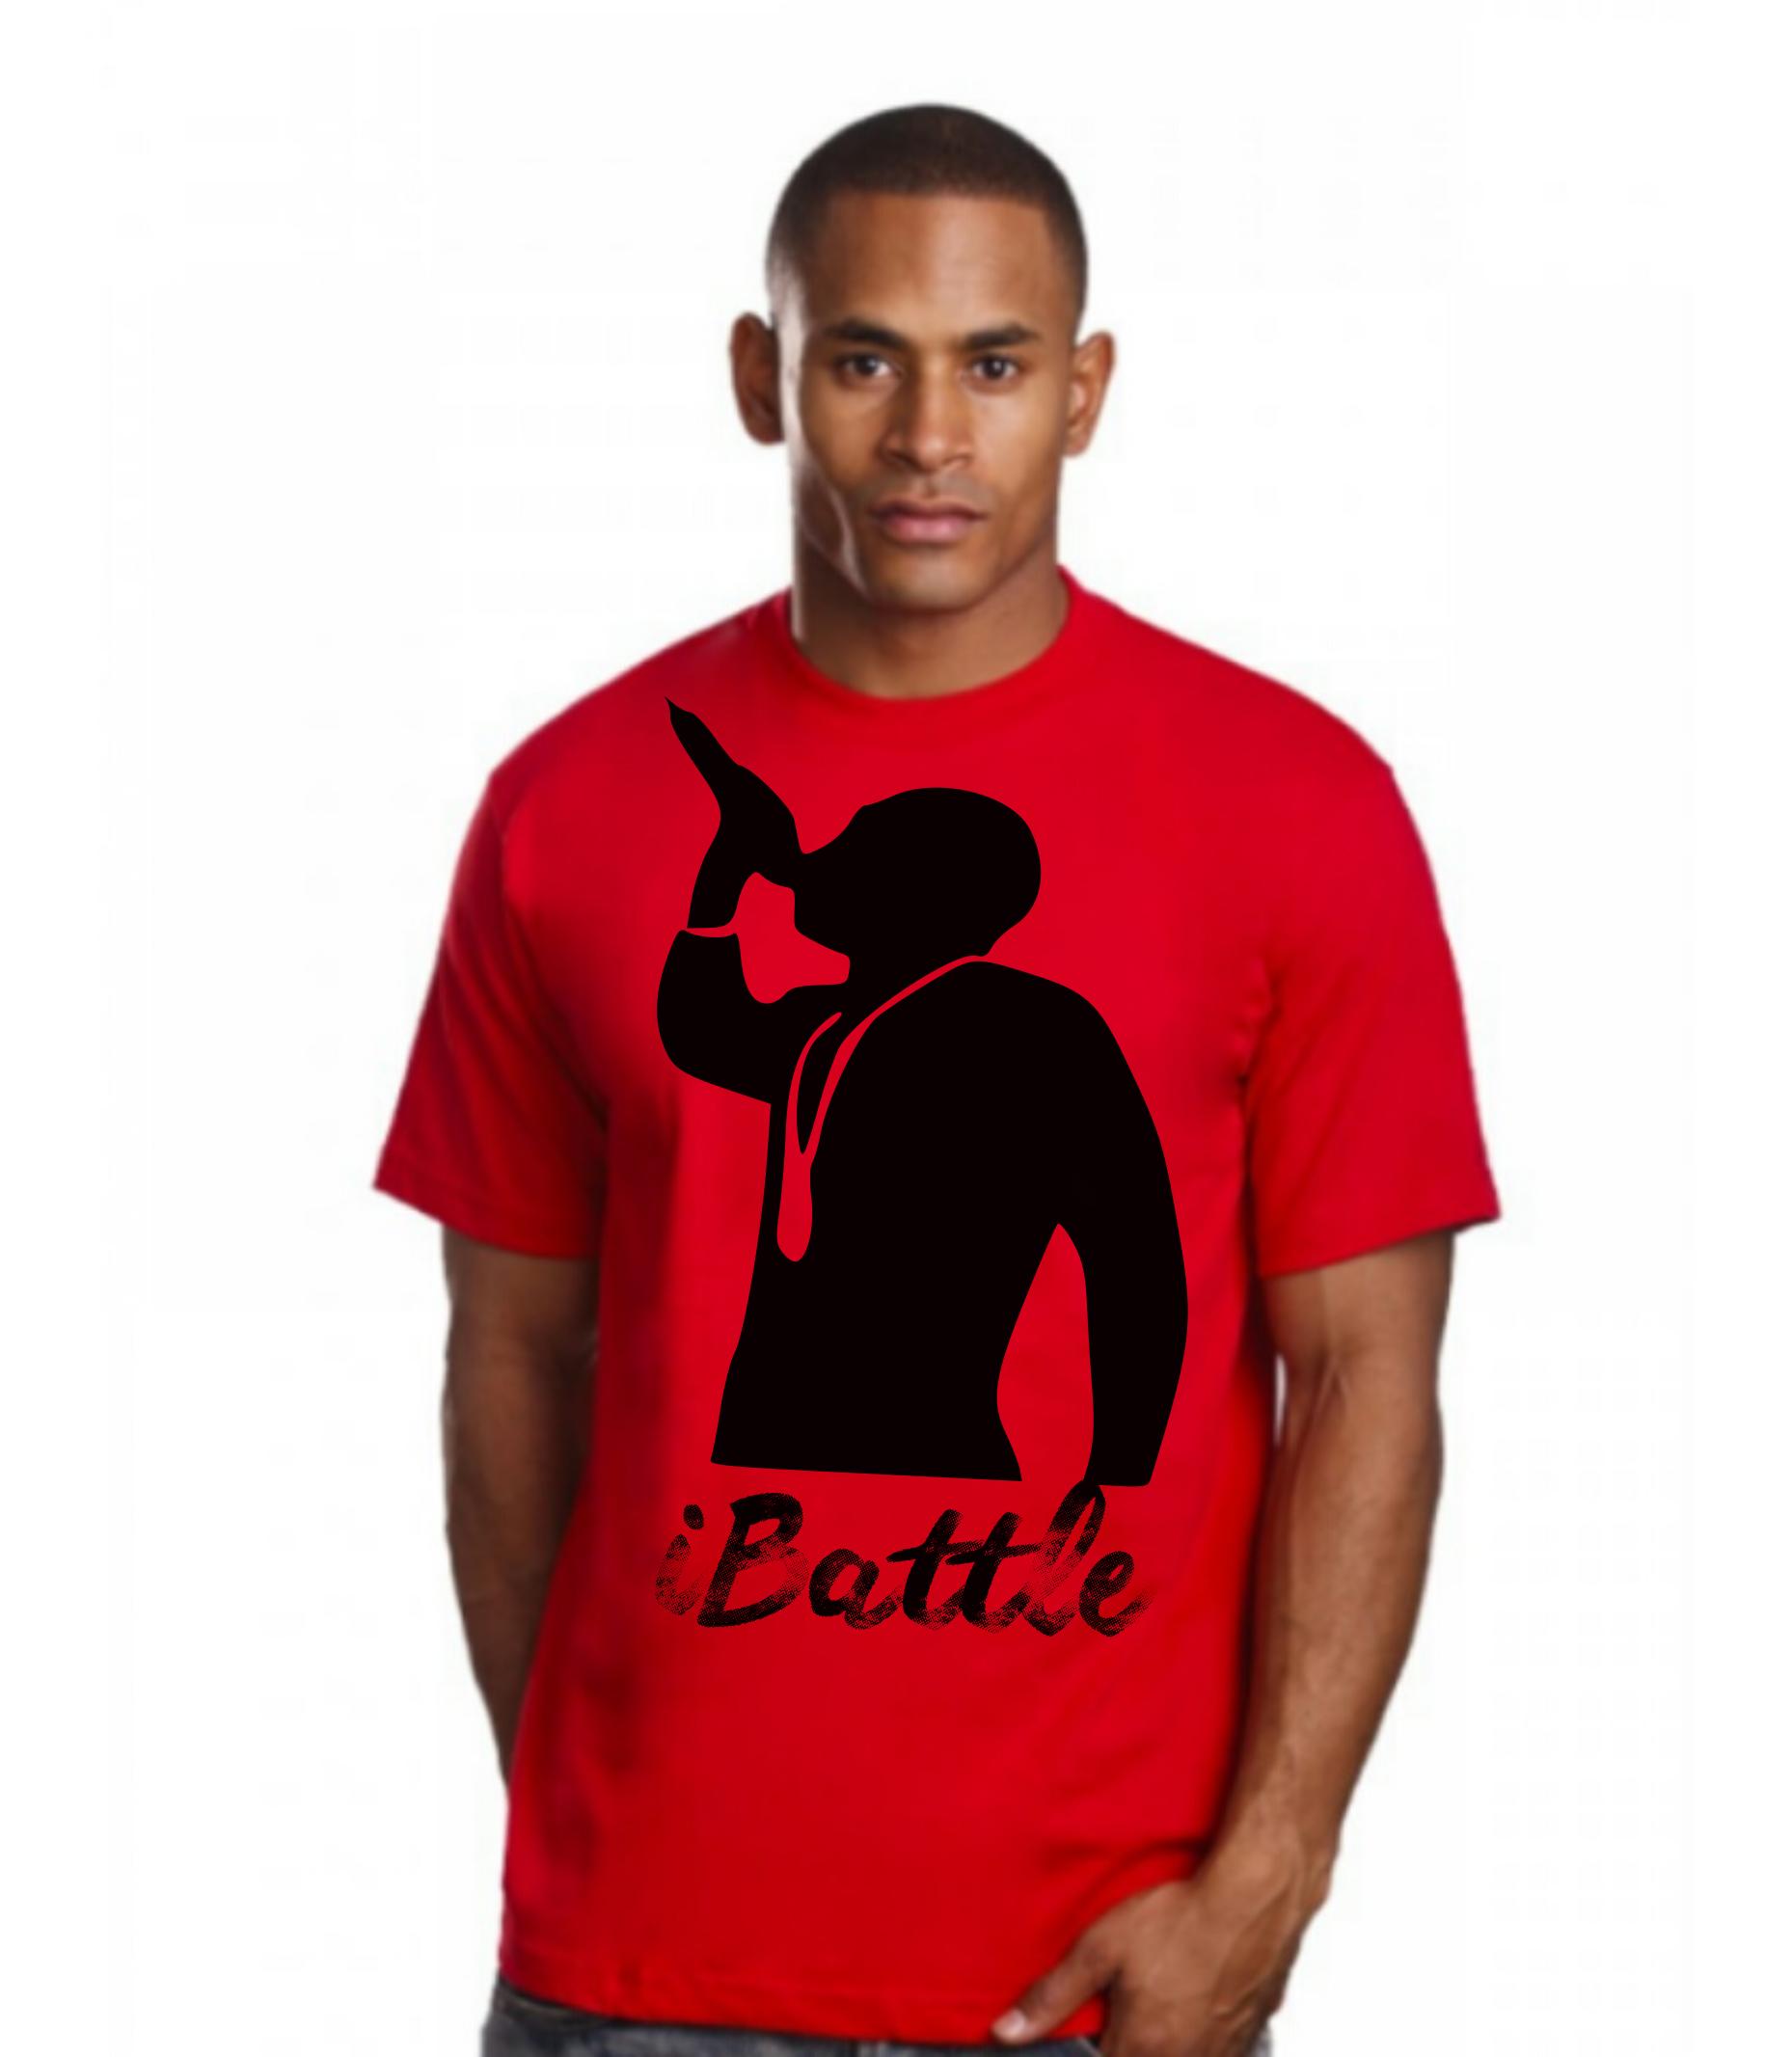 BRG-Model-iBattleTee-Red-Black - Copy